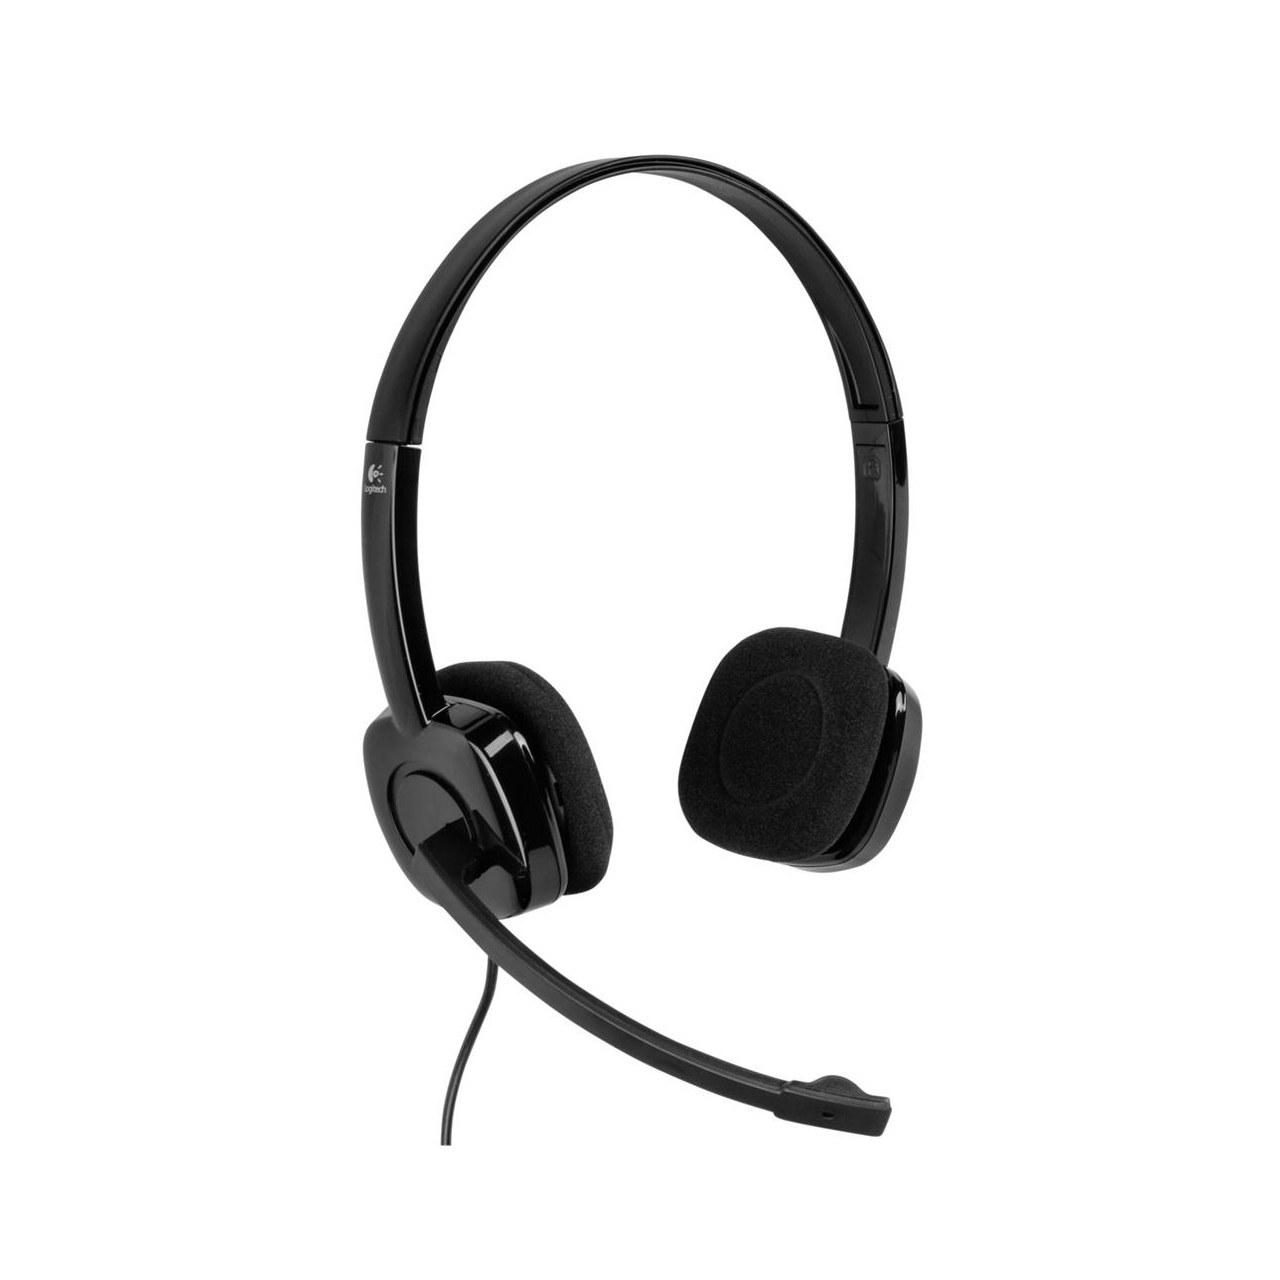 تصویر هدست روگوشی استریو لاجیتک مدل H151 Logitech H151 Stereo On-Ear Headset